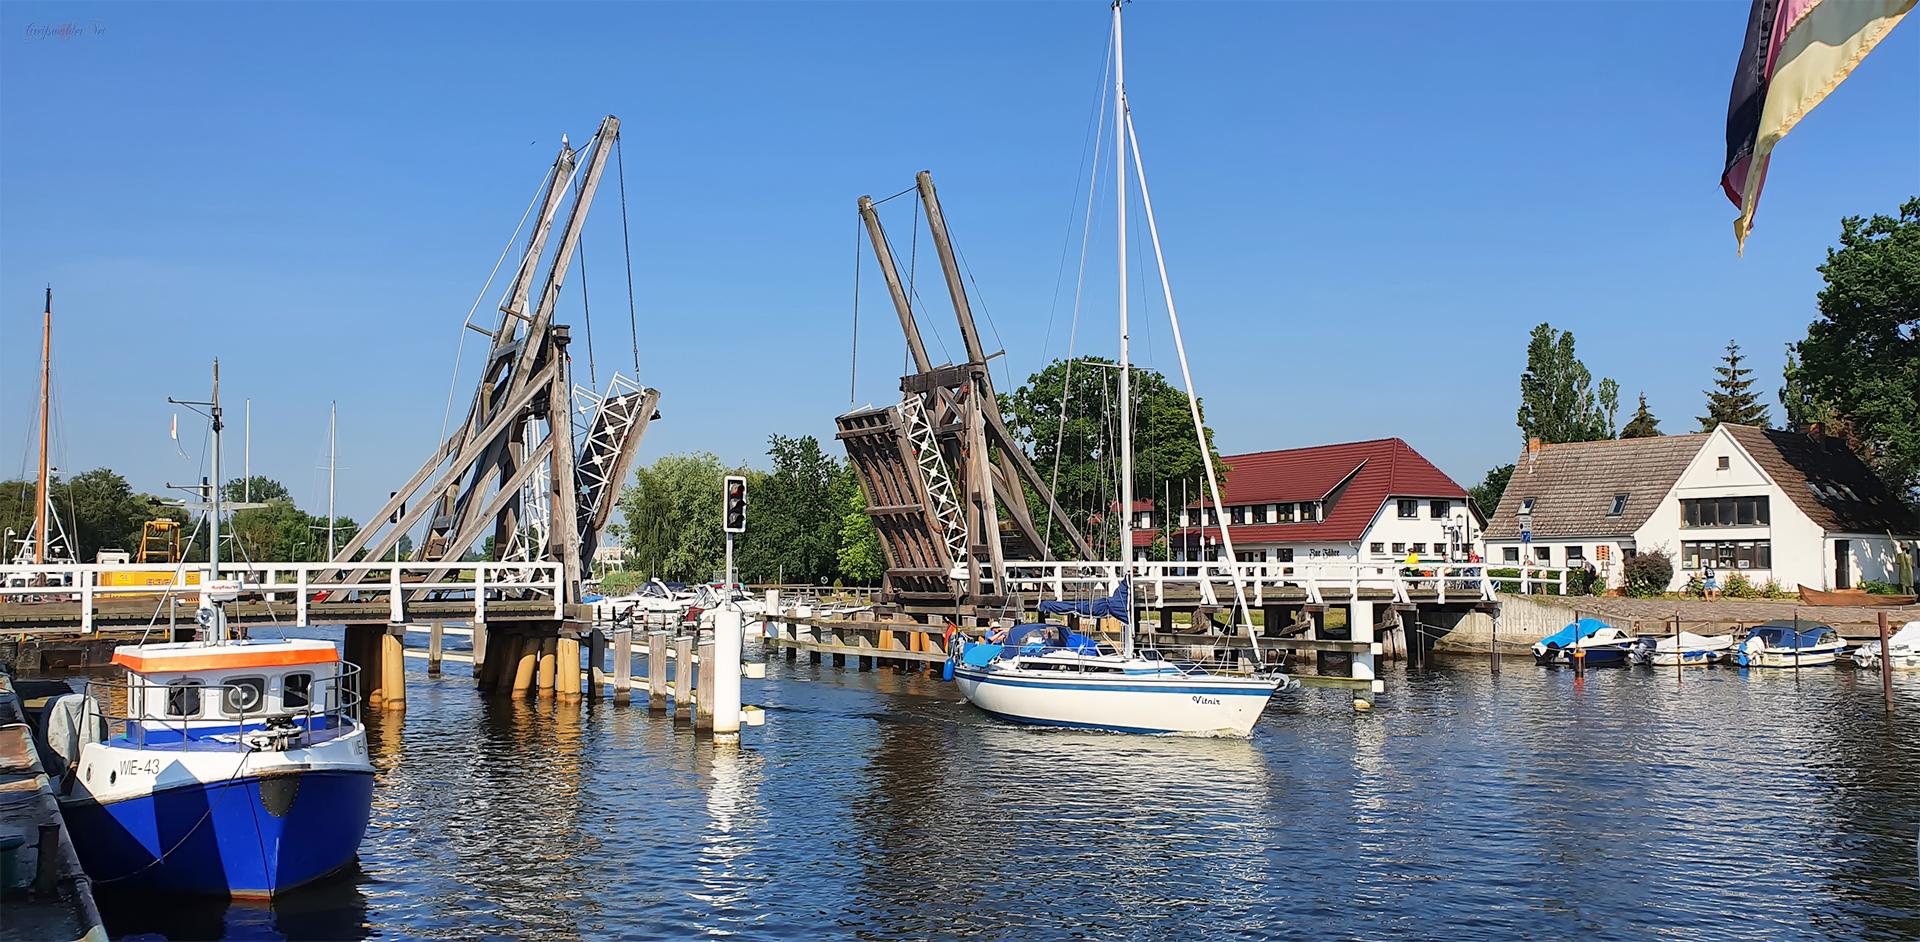 Sommer an der Holzklappbrücke in Greifswald-Wieck